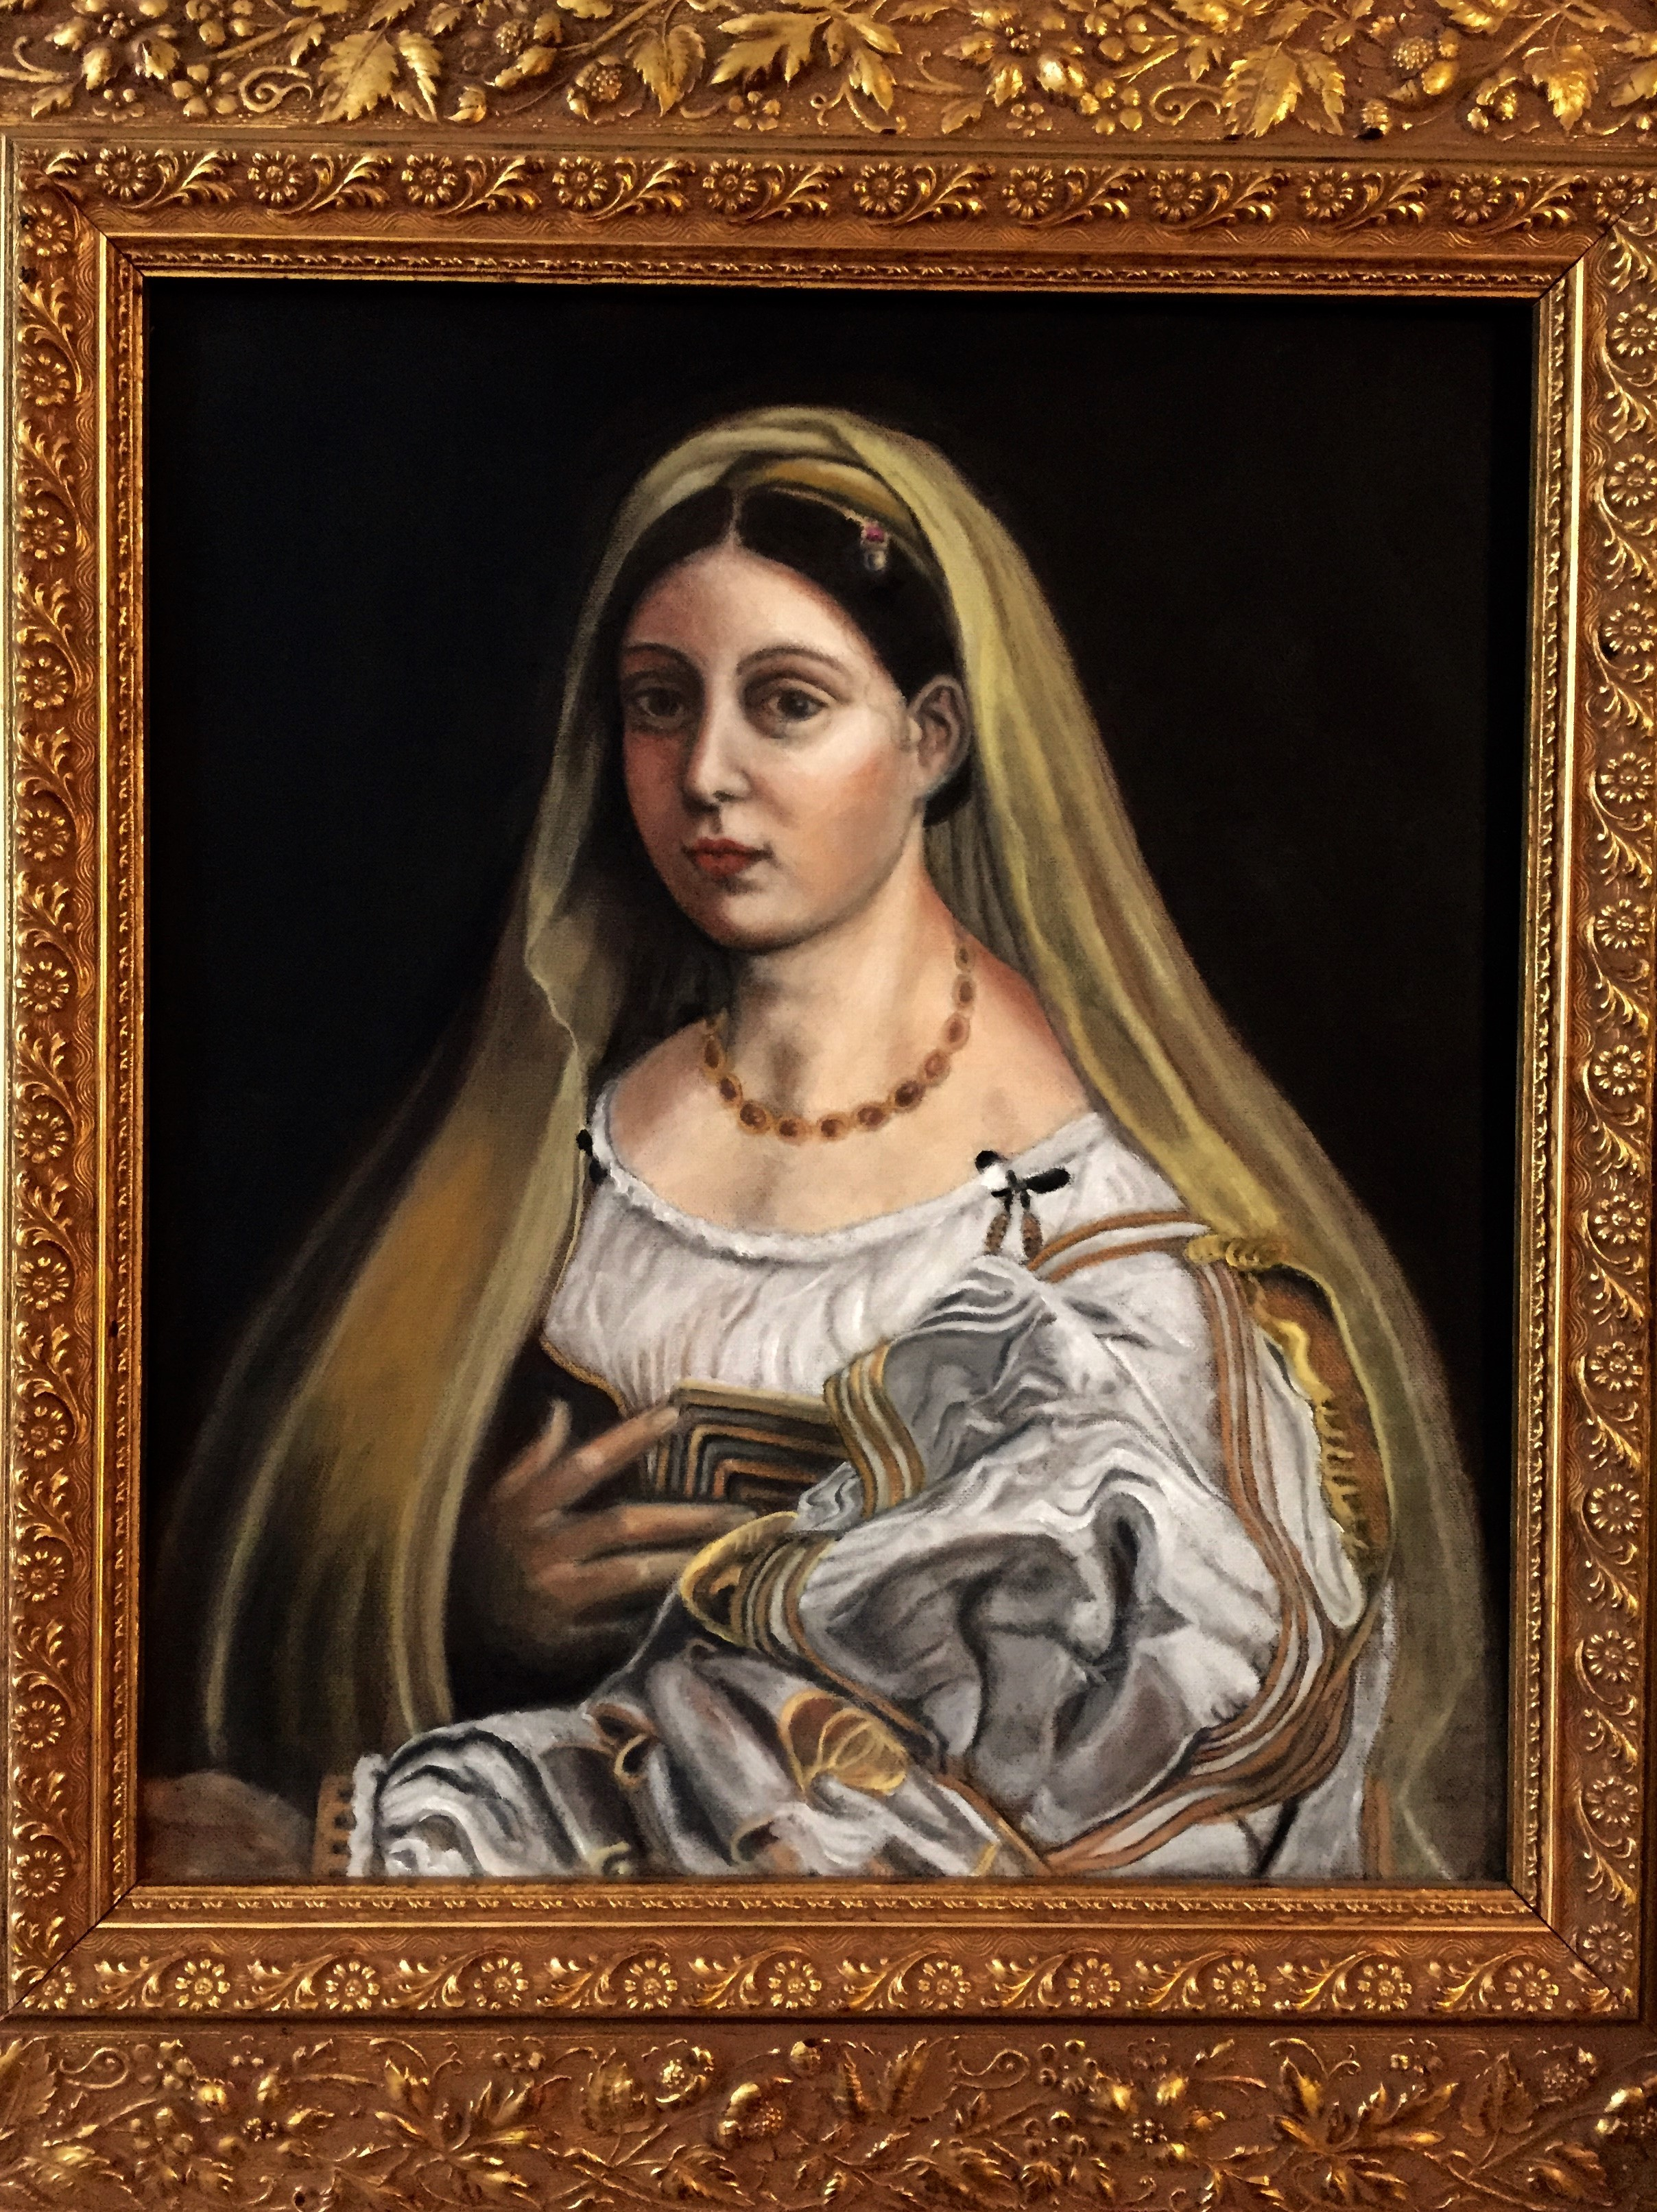 Oil study of Raphael's La Donna Velata